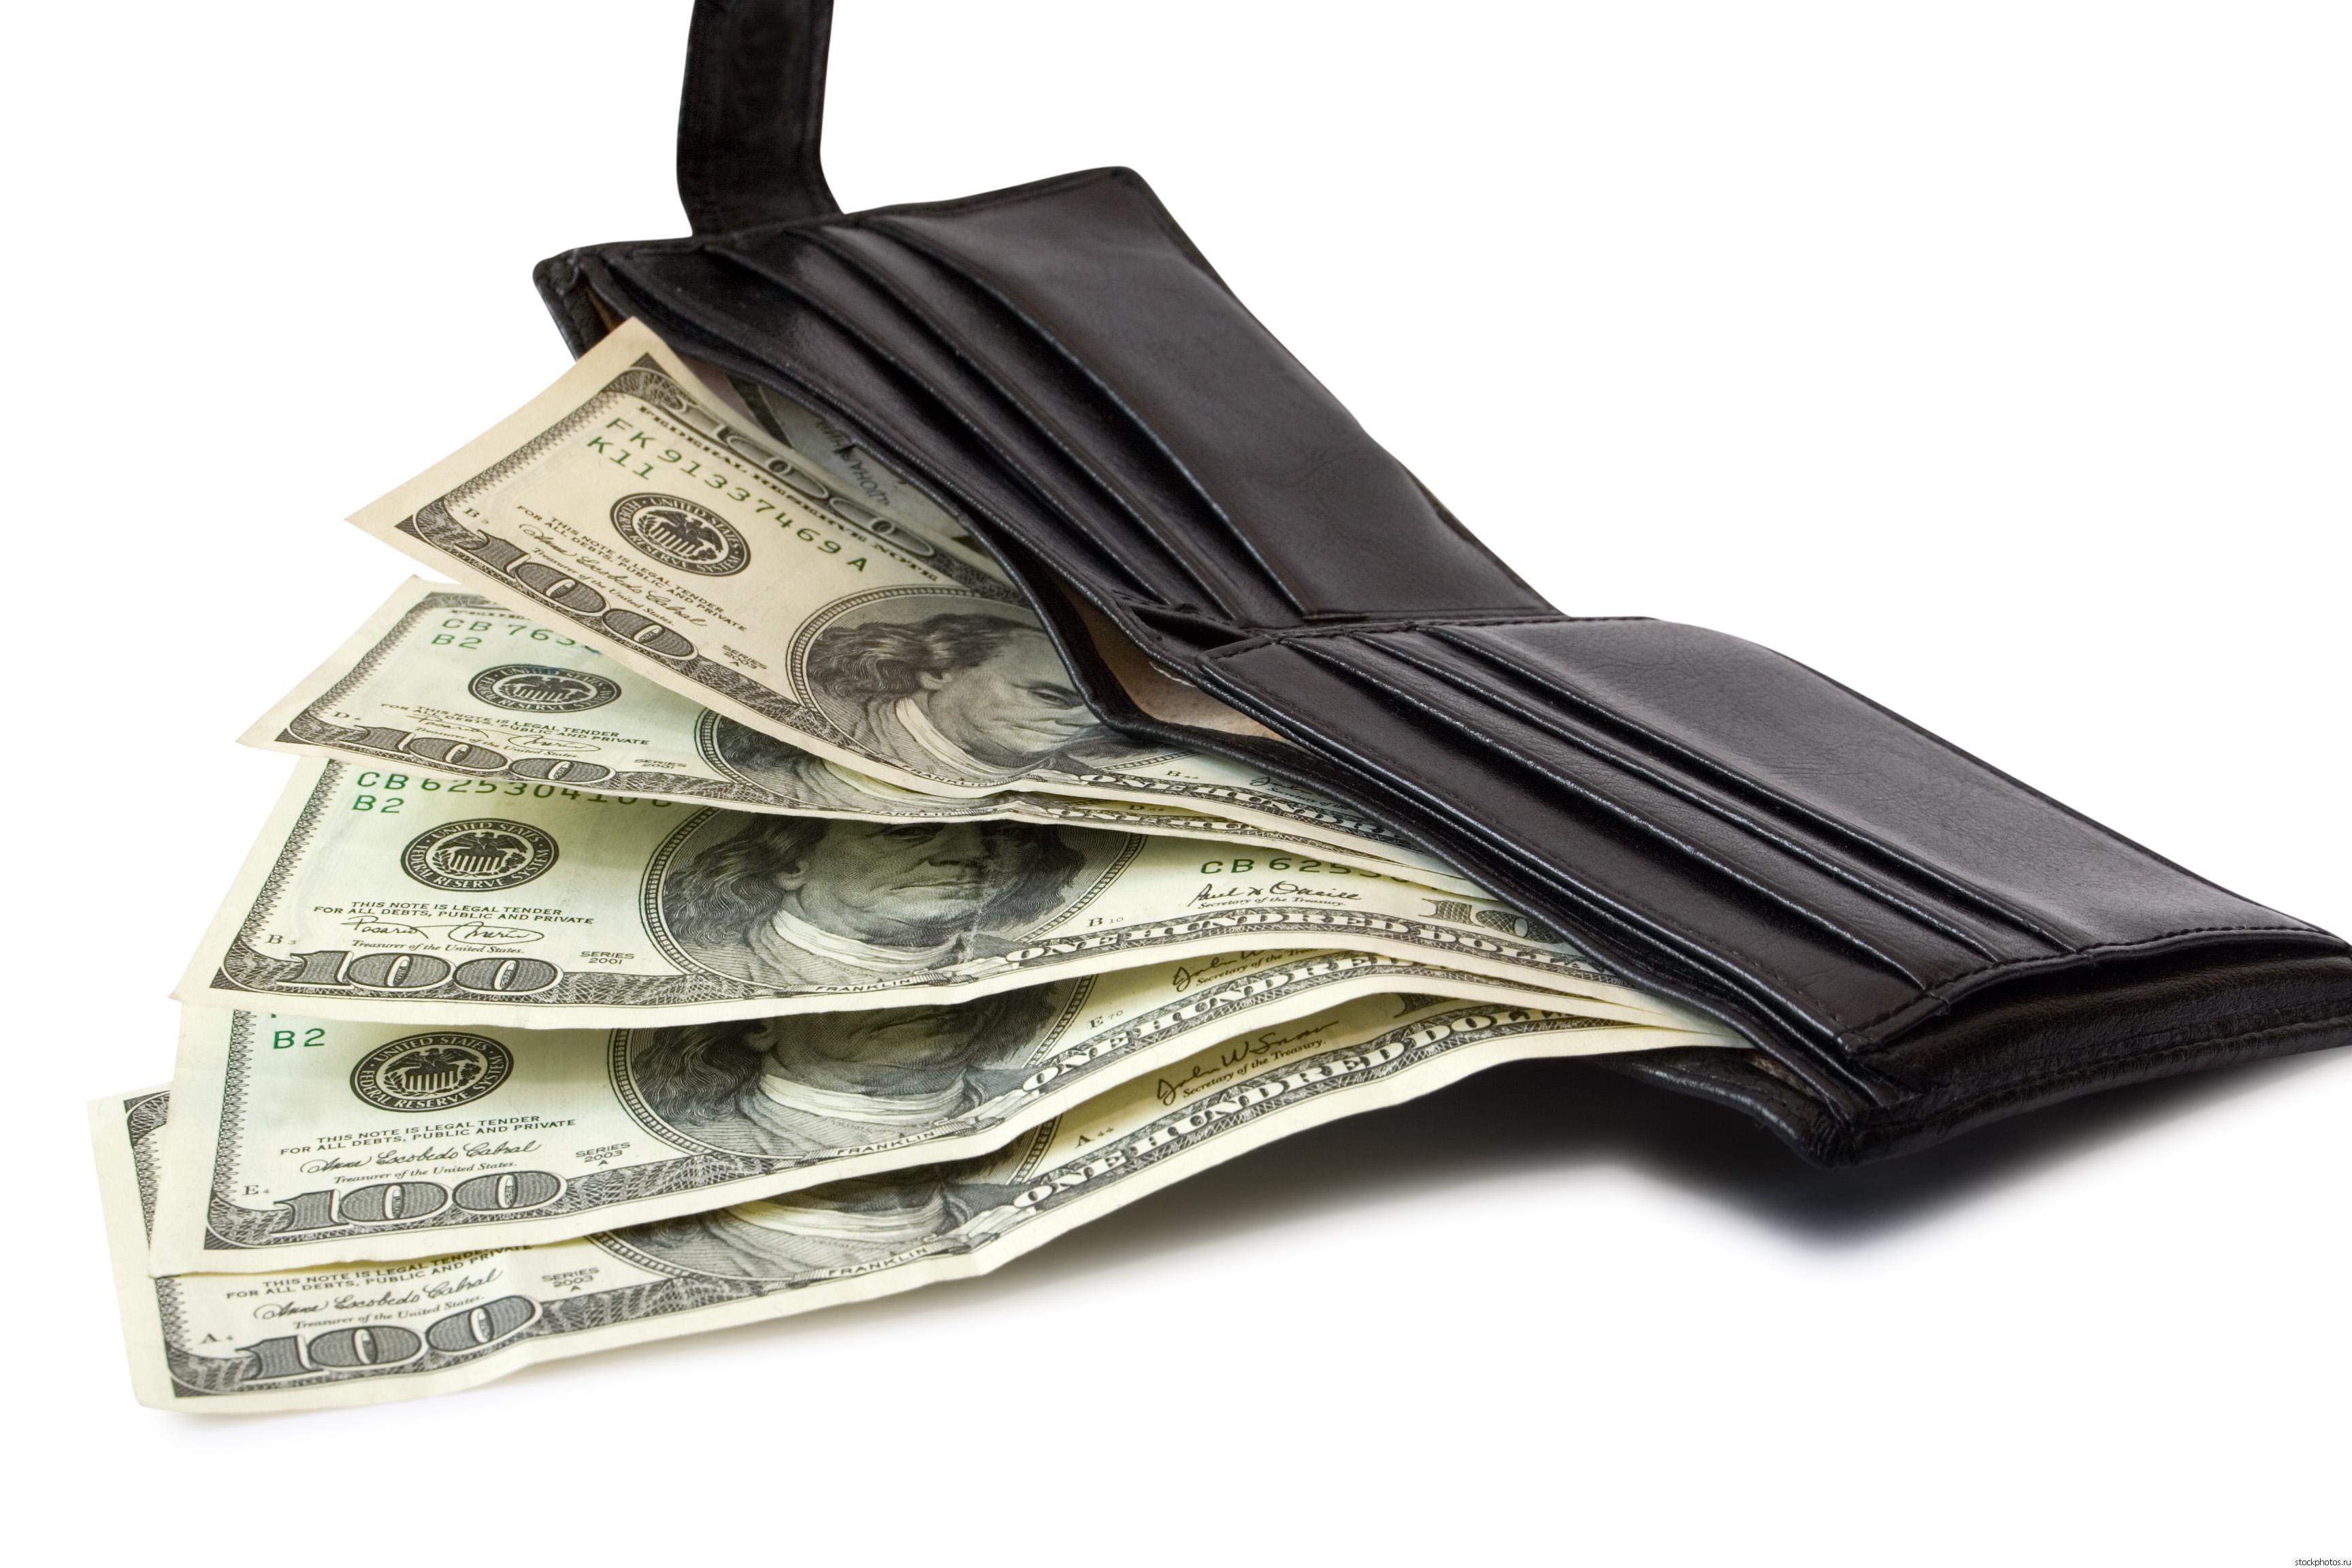 Сводка цен на валюту. По данным НБУ валюта дорожает.